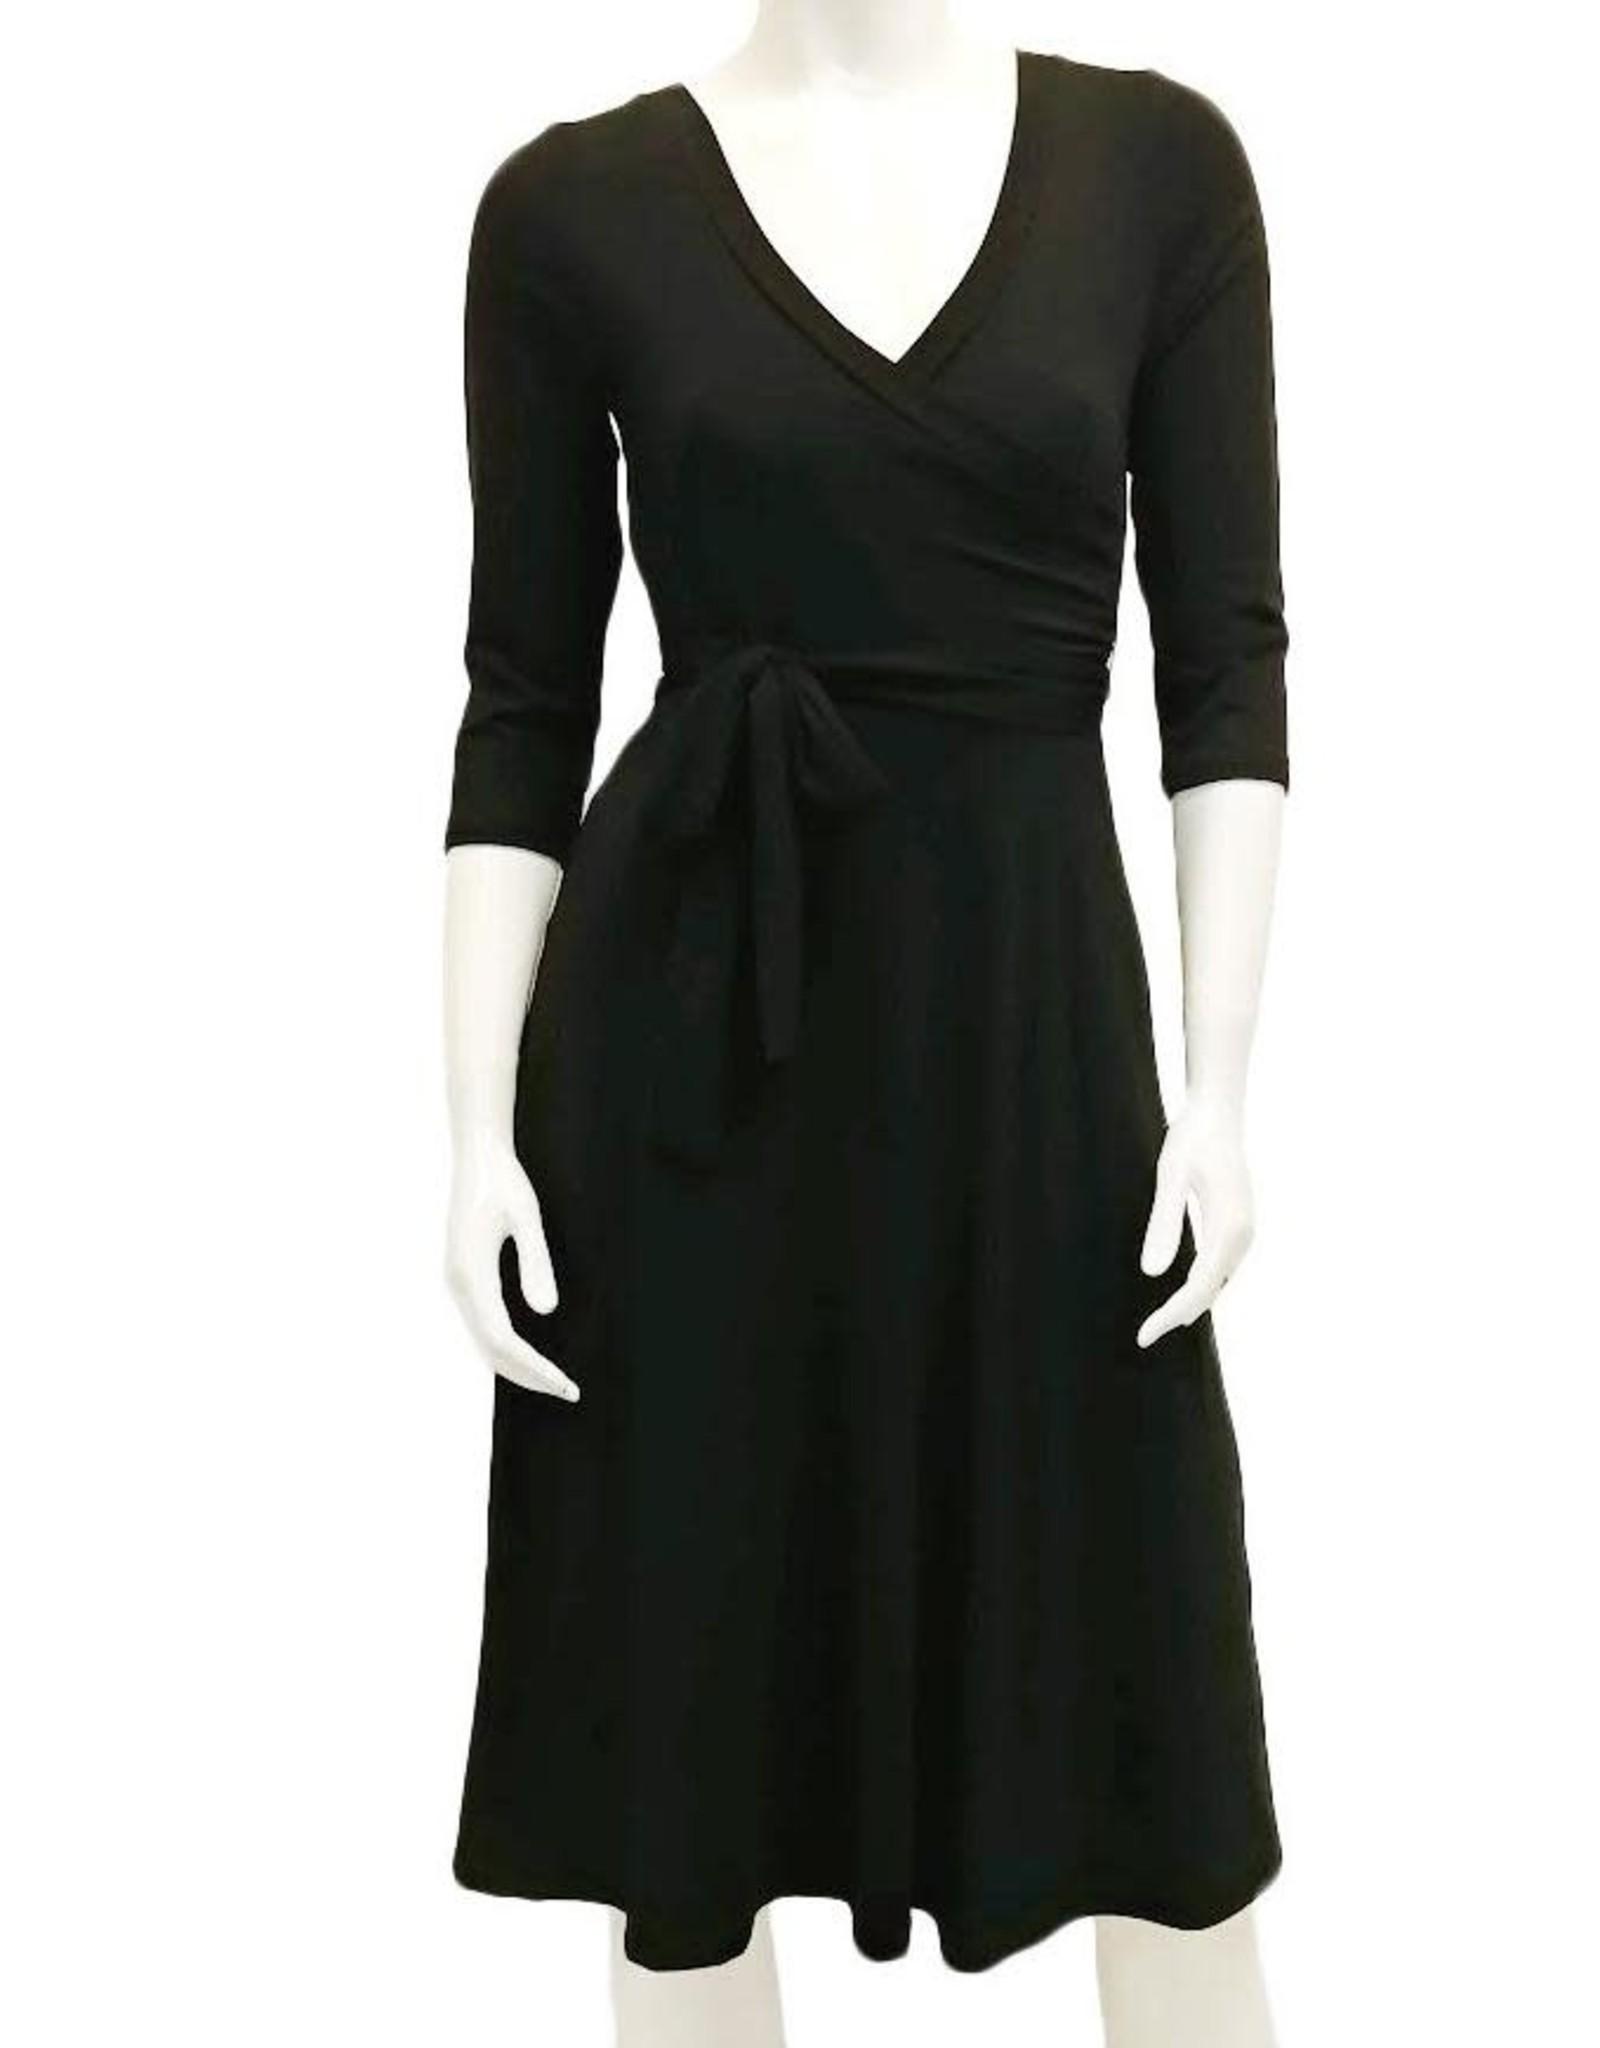 Gilmour BD-3020 Bamboo Faux Wrap Dress